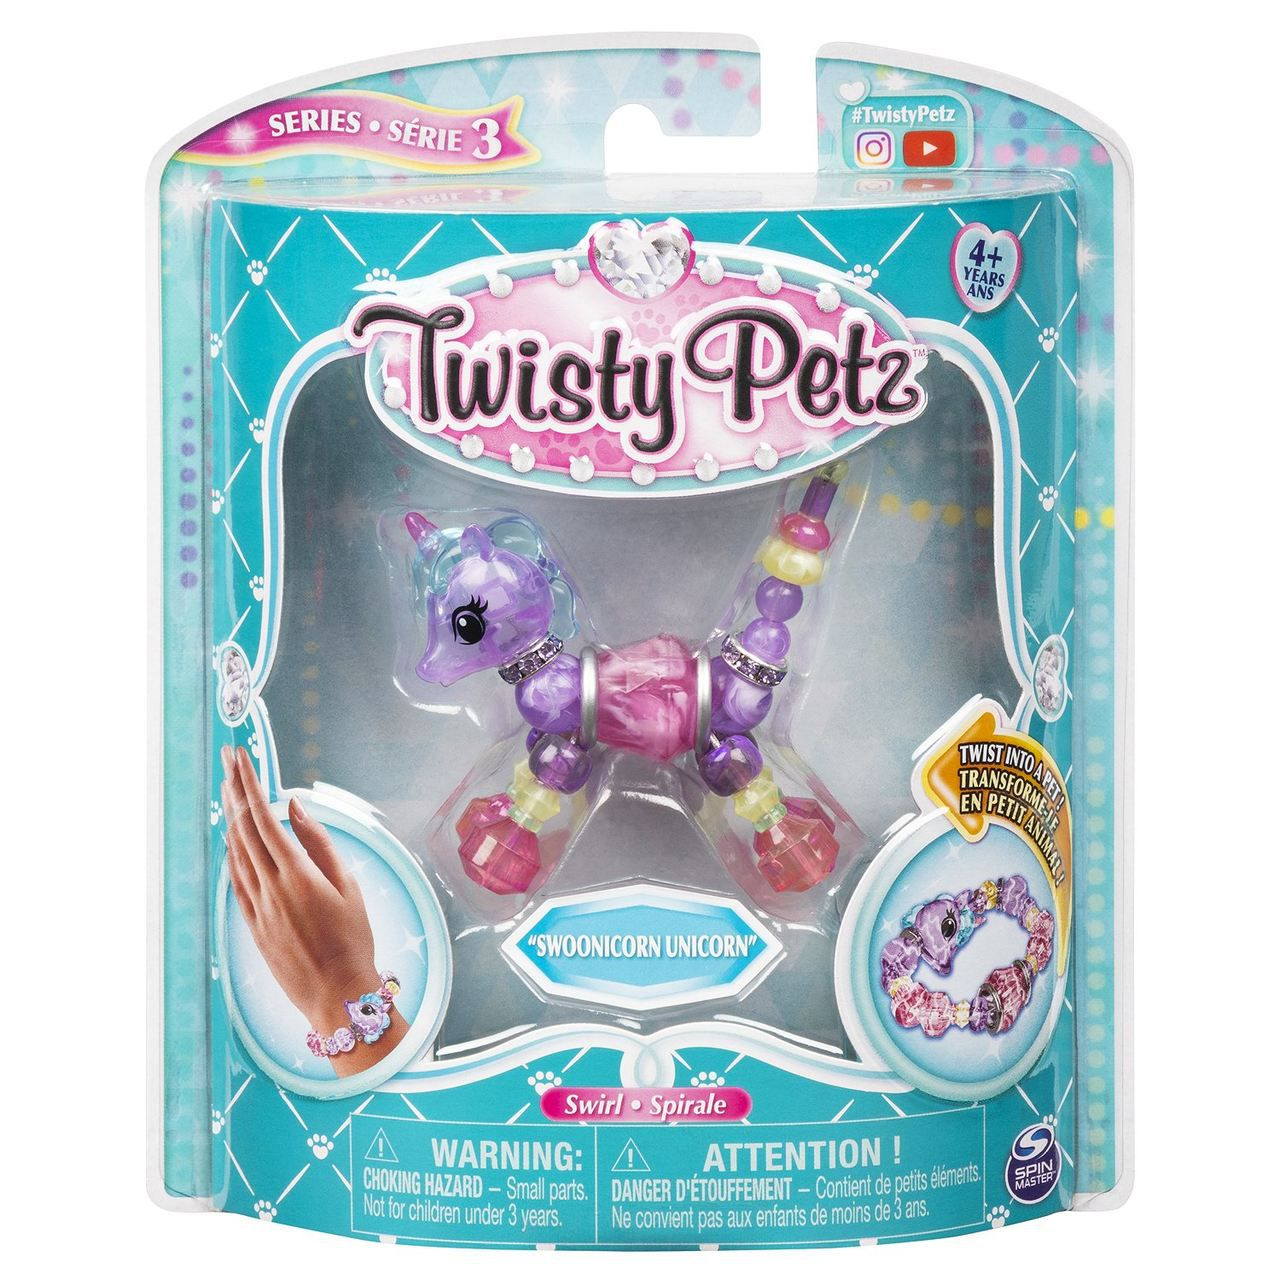 Twisty Petz Pulseira - Single - Swoonicorn Unicórnio - Sunny